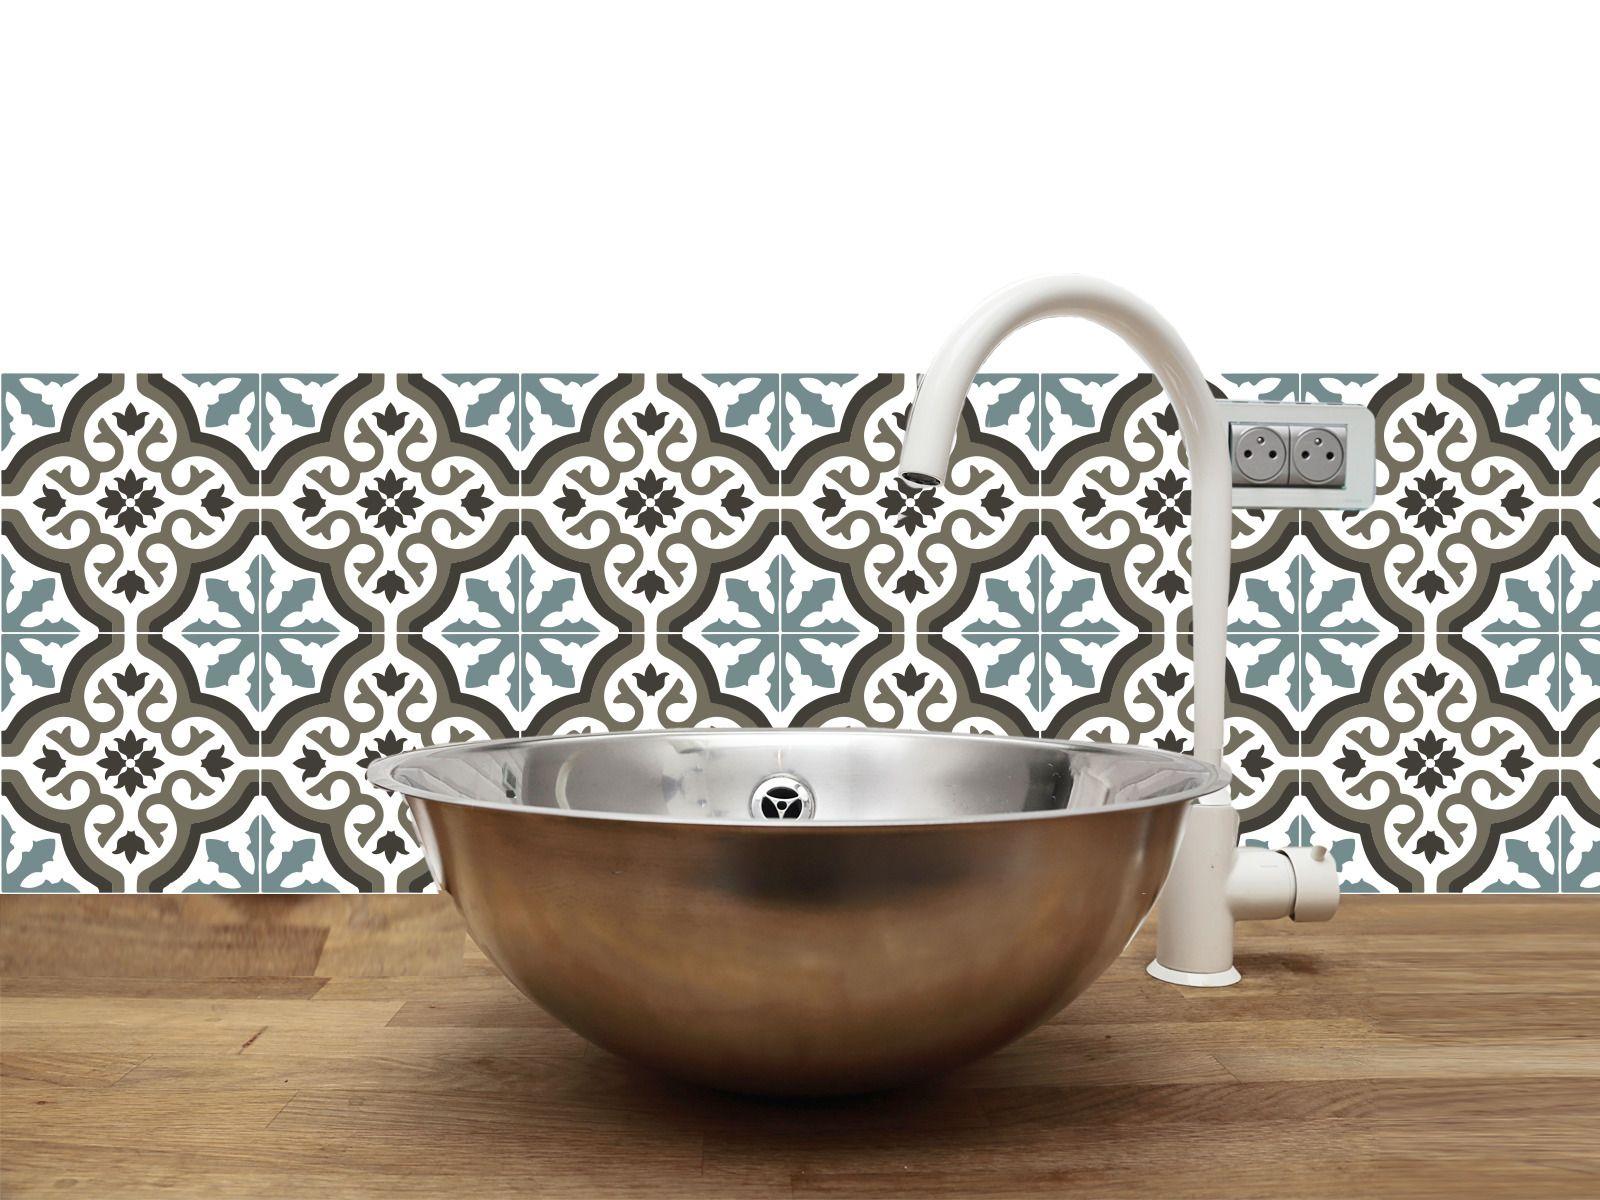 trianon bleu adh sif imperm abilis fa on carreaux de. Black Bedroom Furniture Sets. Home Design Ideas